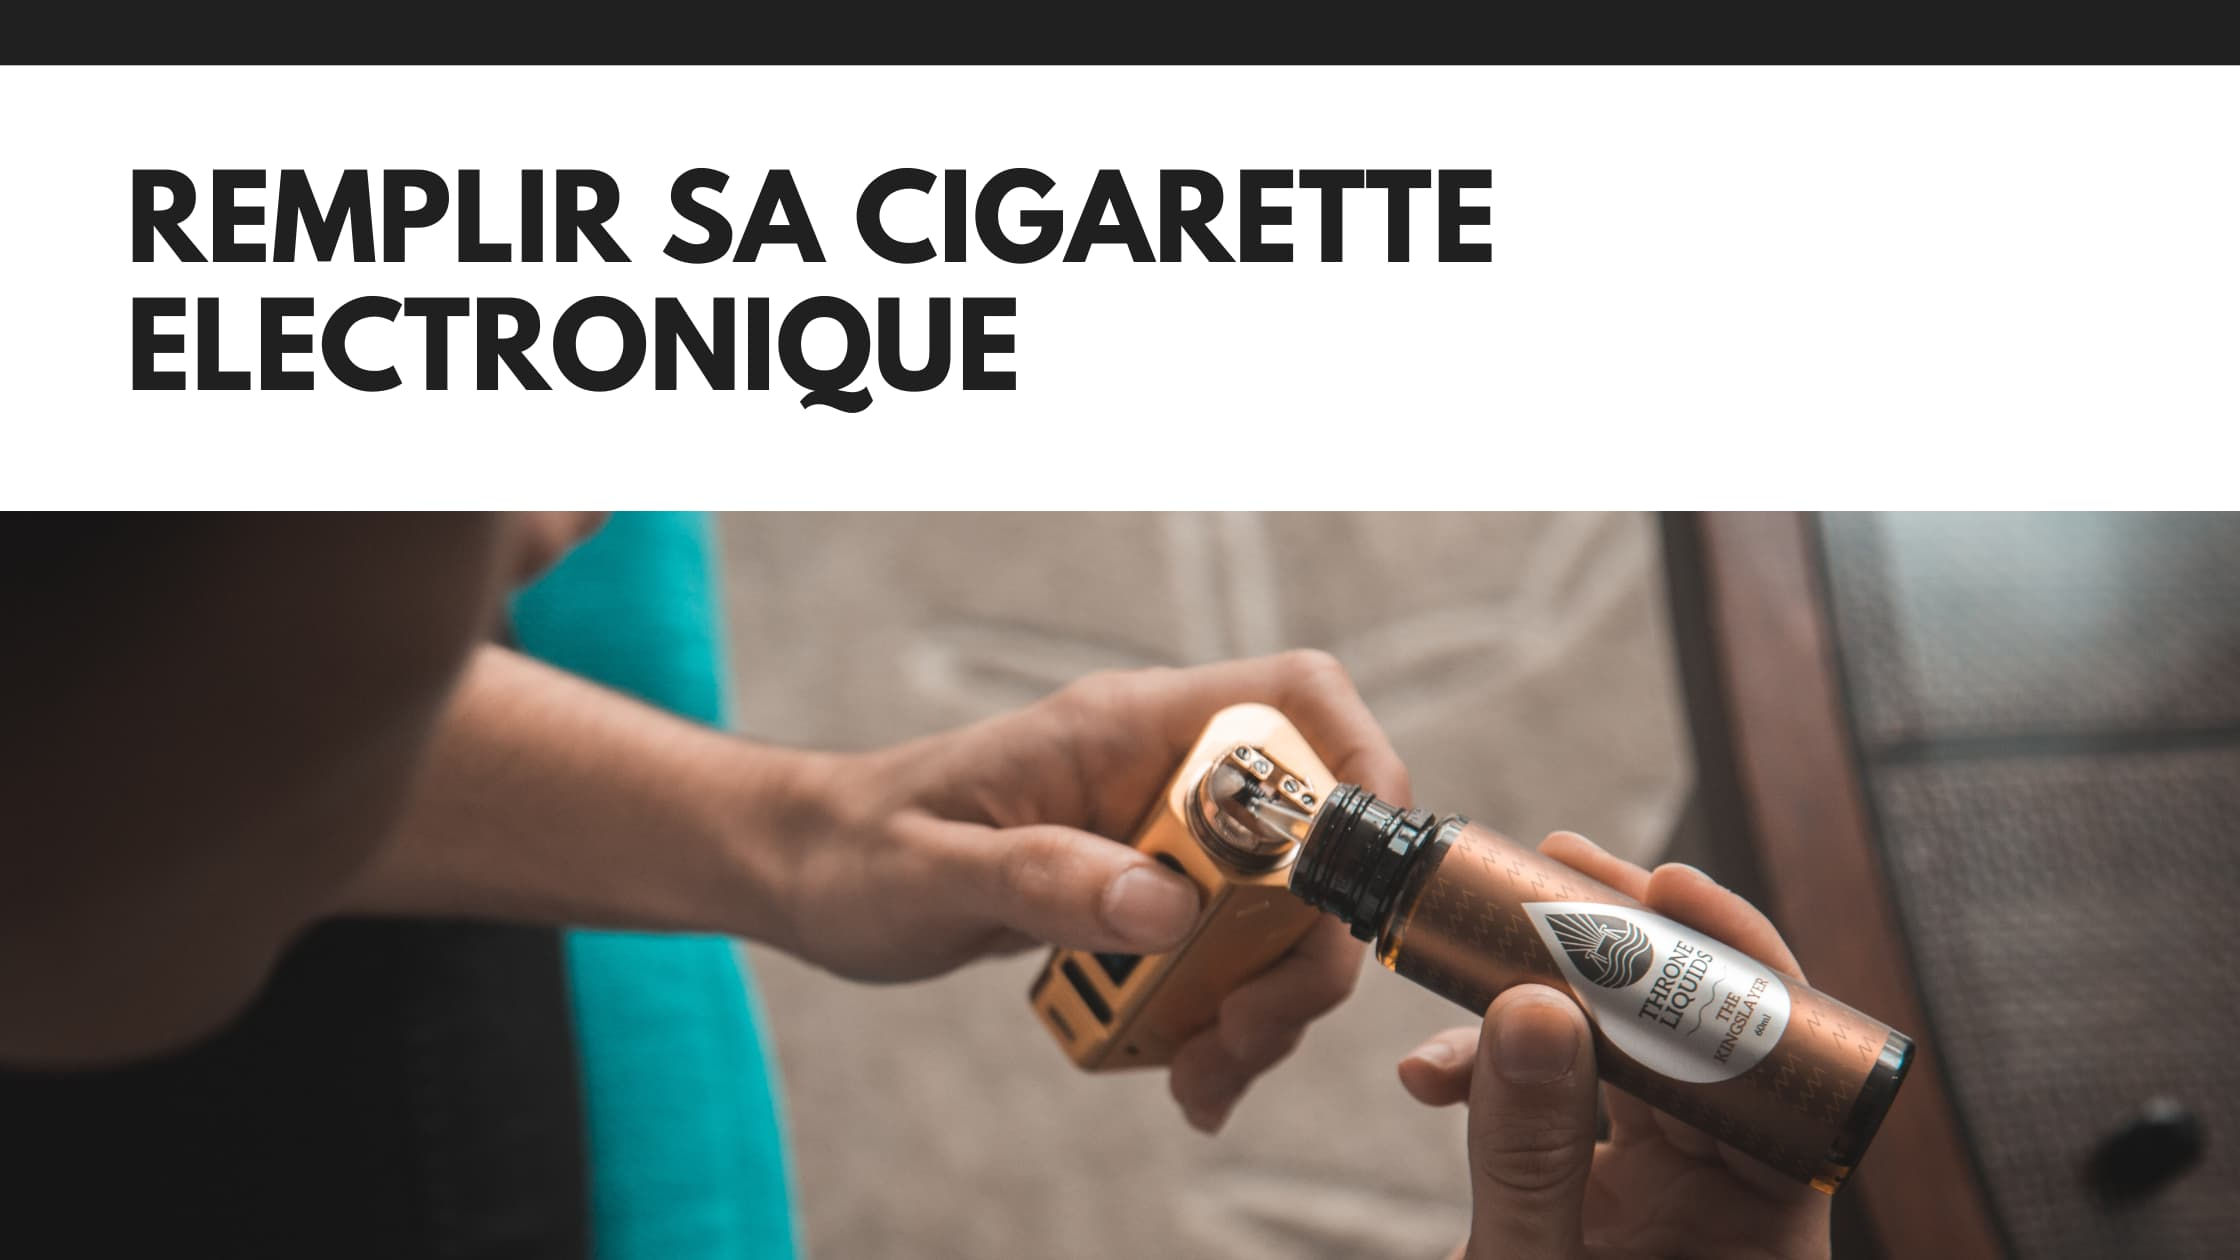 remplir sa cigarette electronique